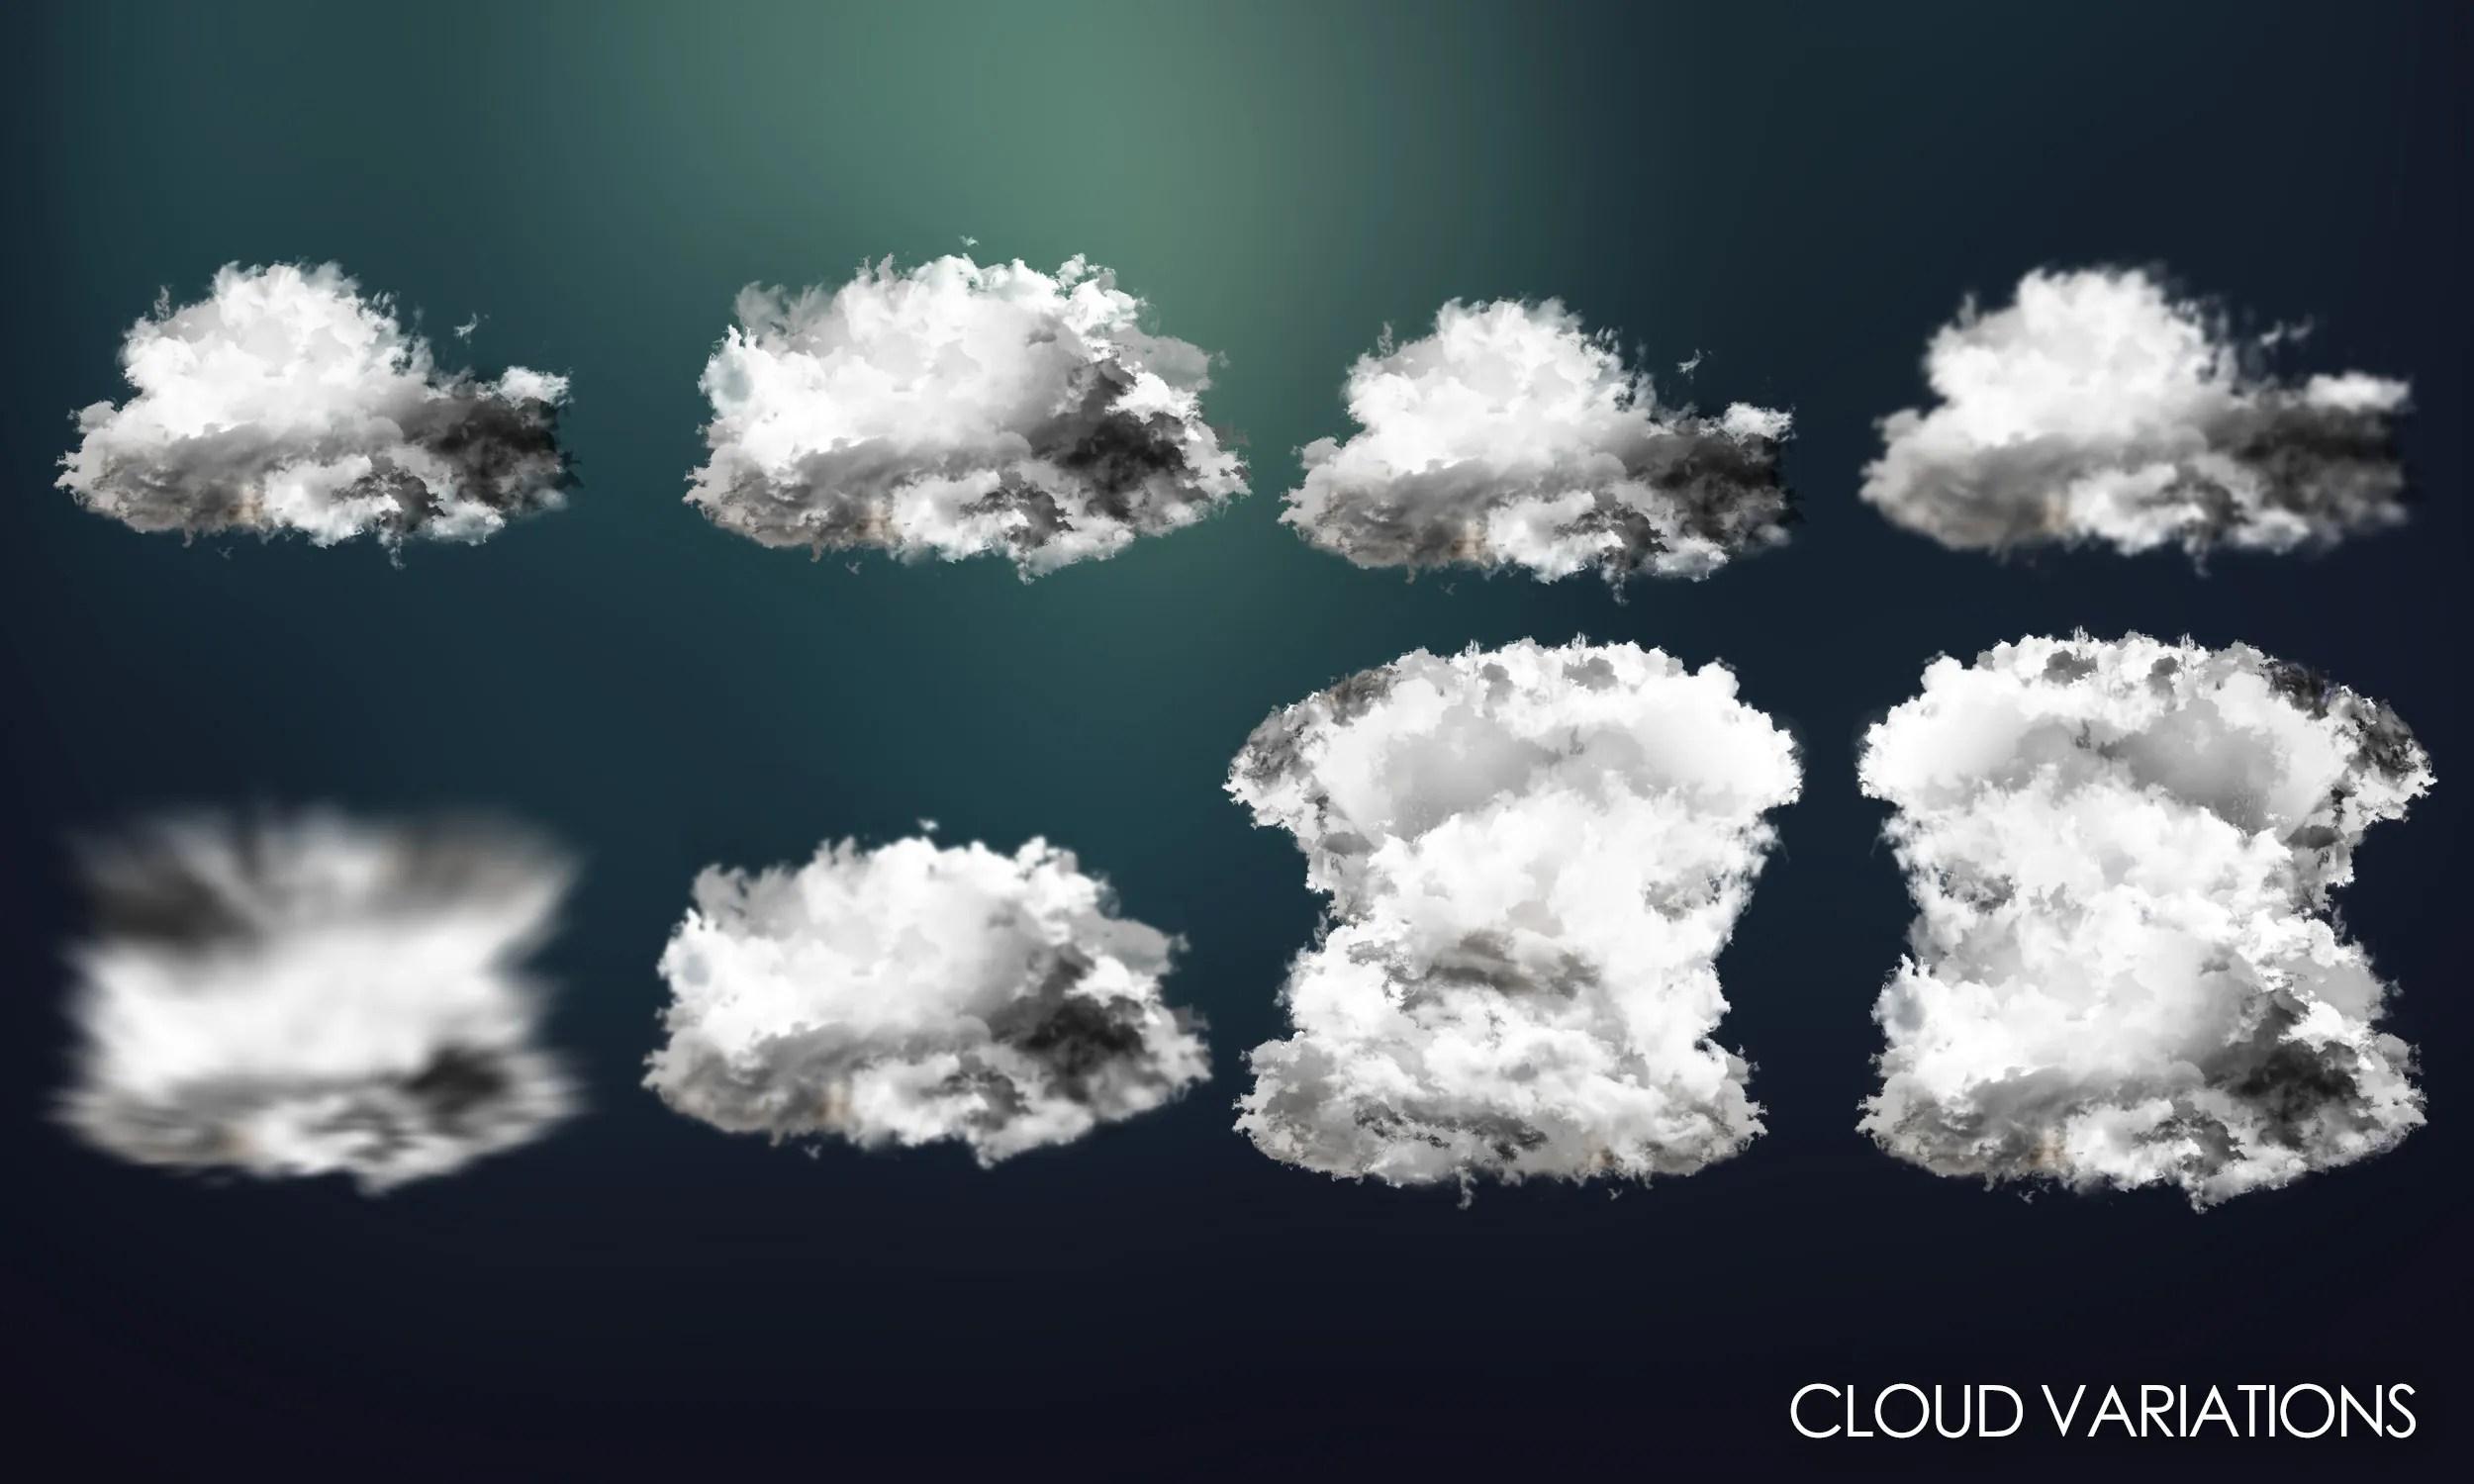 Cloud Variations